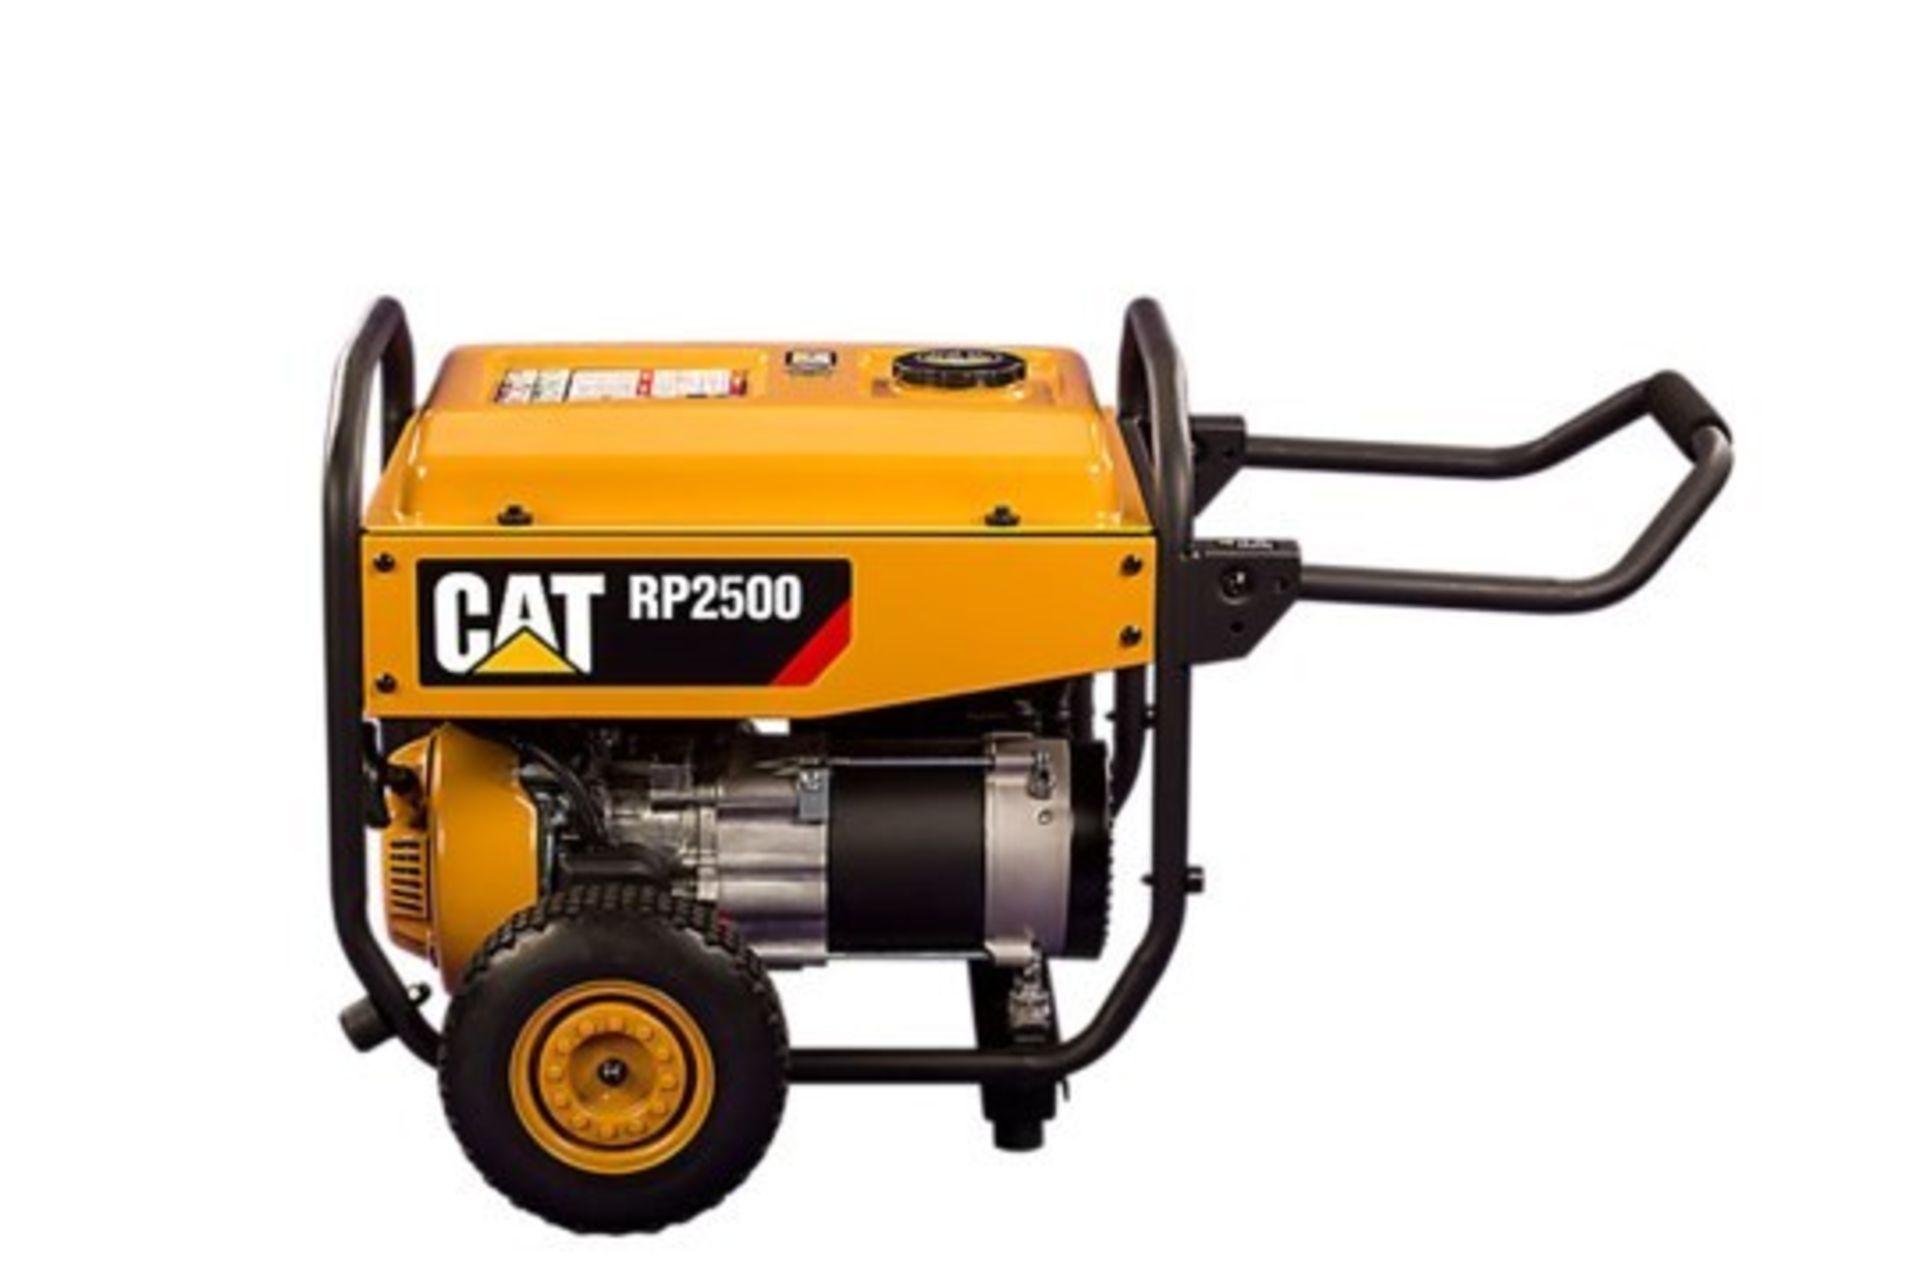 Lot 25870 - UNISSUED Caterpillar RP2500 Industrial Petrol Generator Set